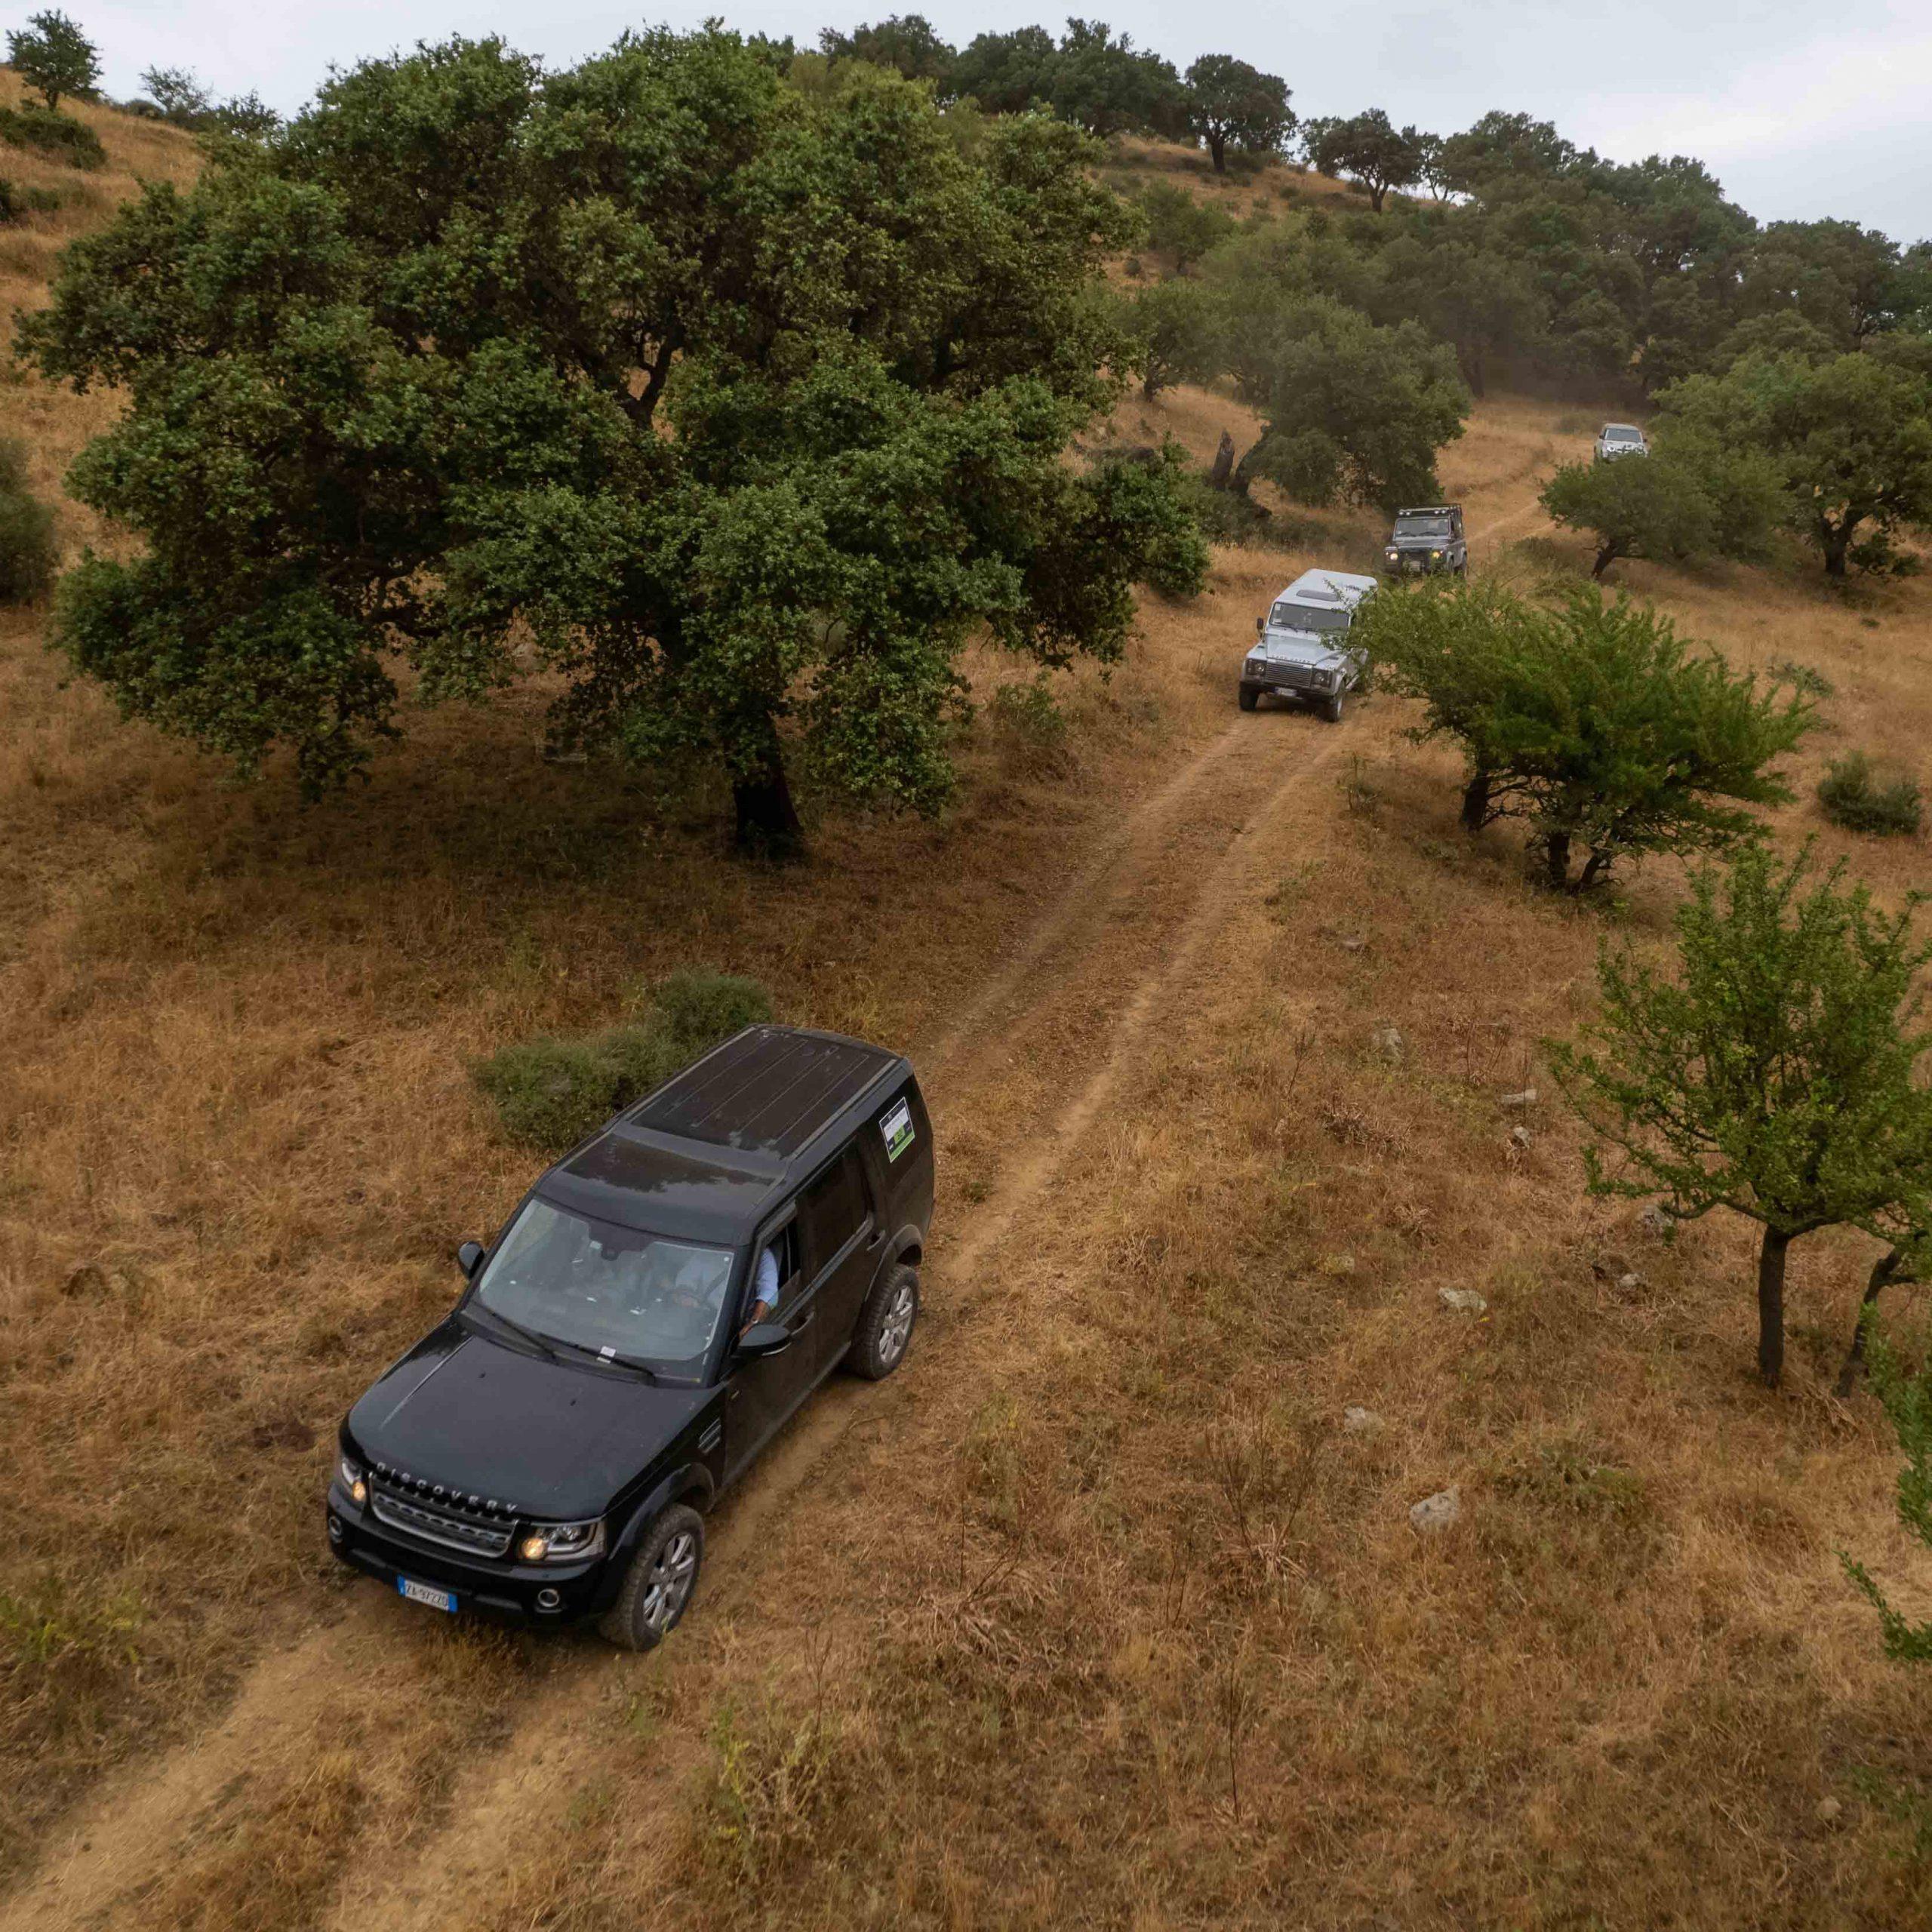 Land_Rover_Tour_Sicilia_2021_Land_Rover_Experience_Italia_-47